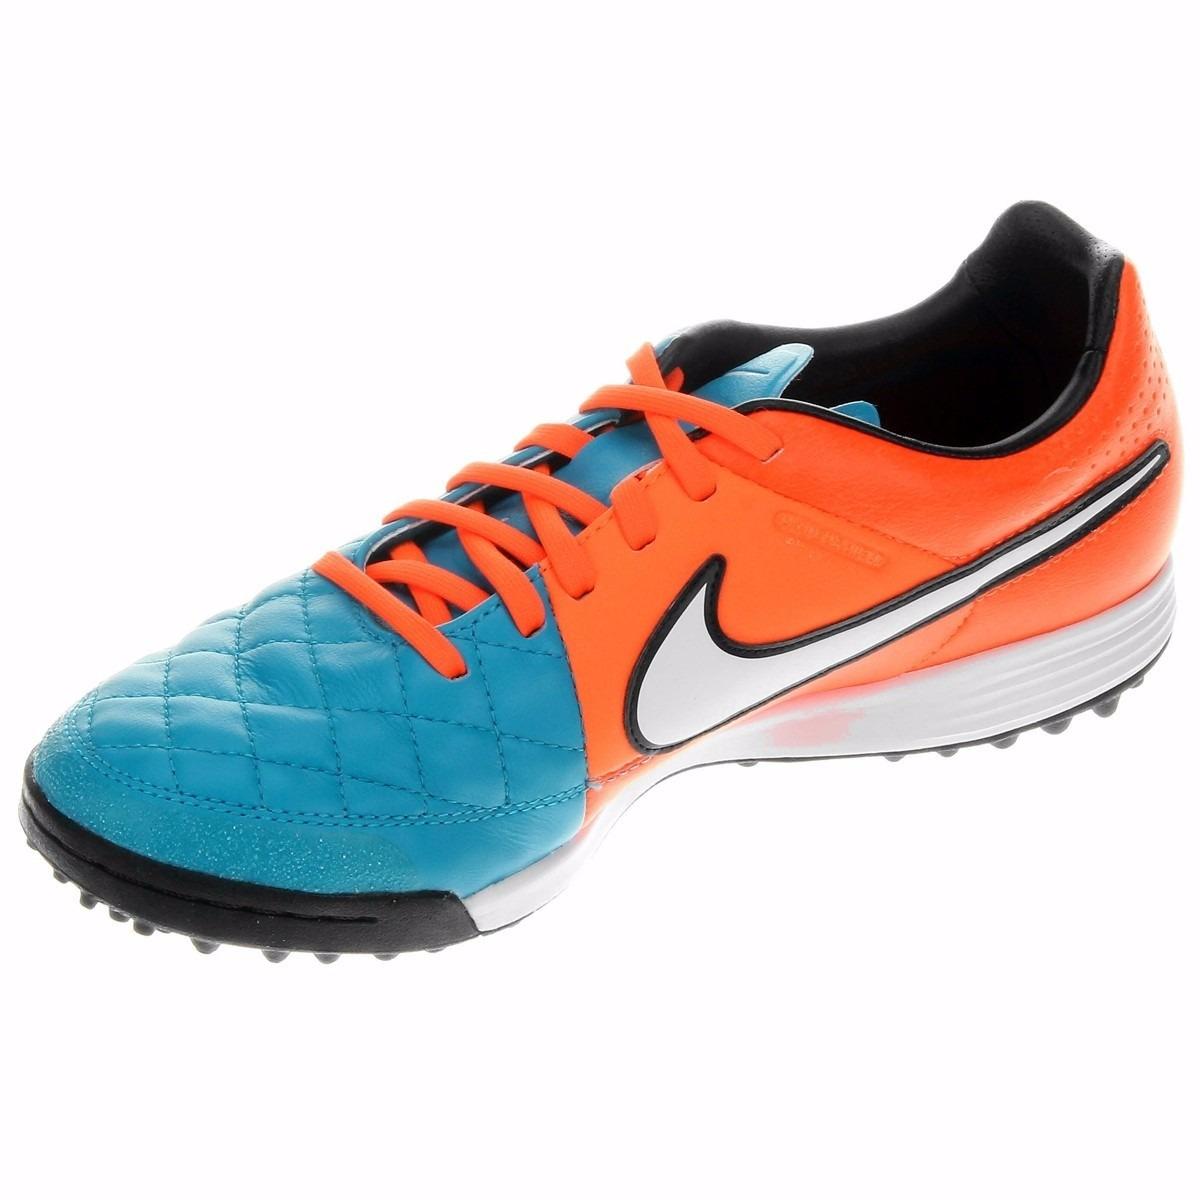 a602301a97576 Chuteira Tênis Society Nike Tiempo Legacy Tf Couro 1magnus - R  279 ...